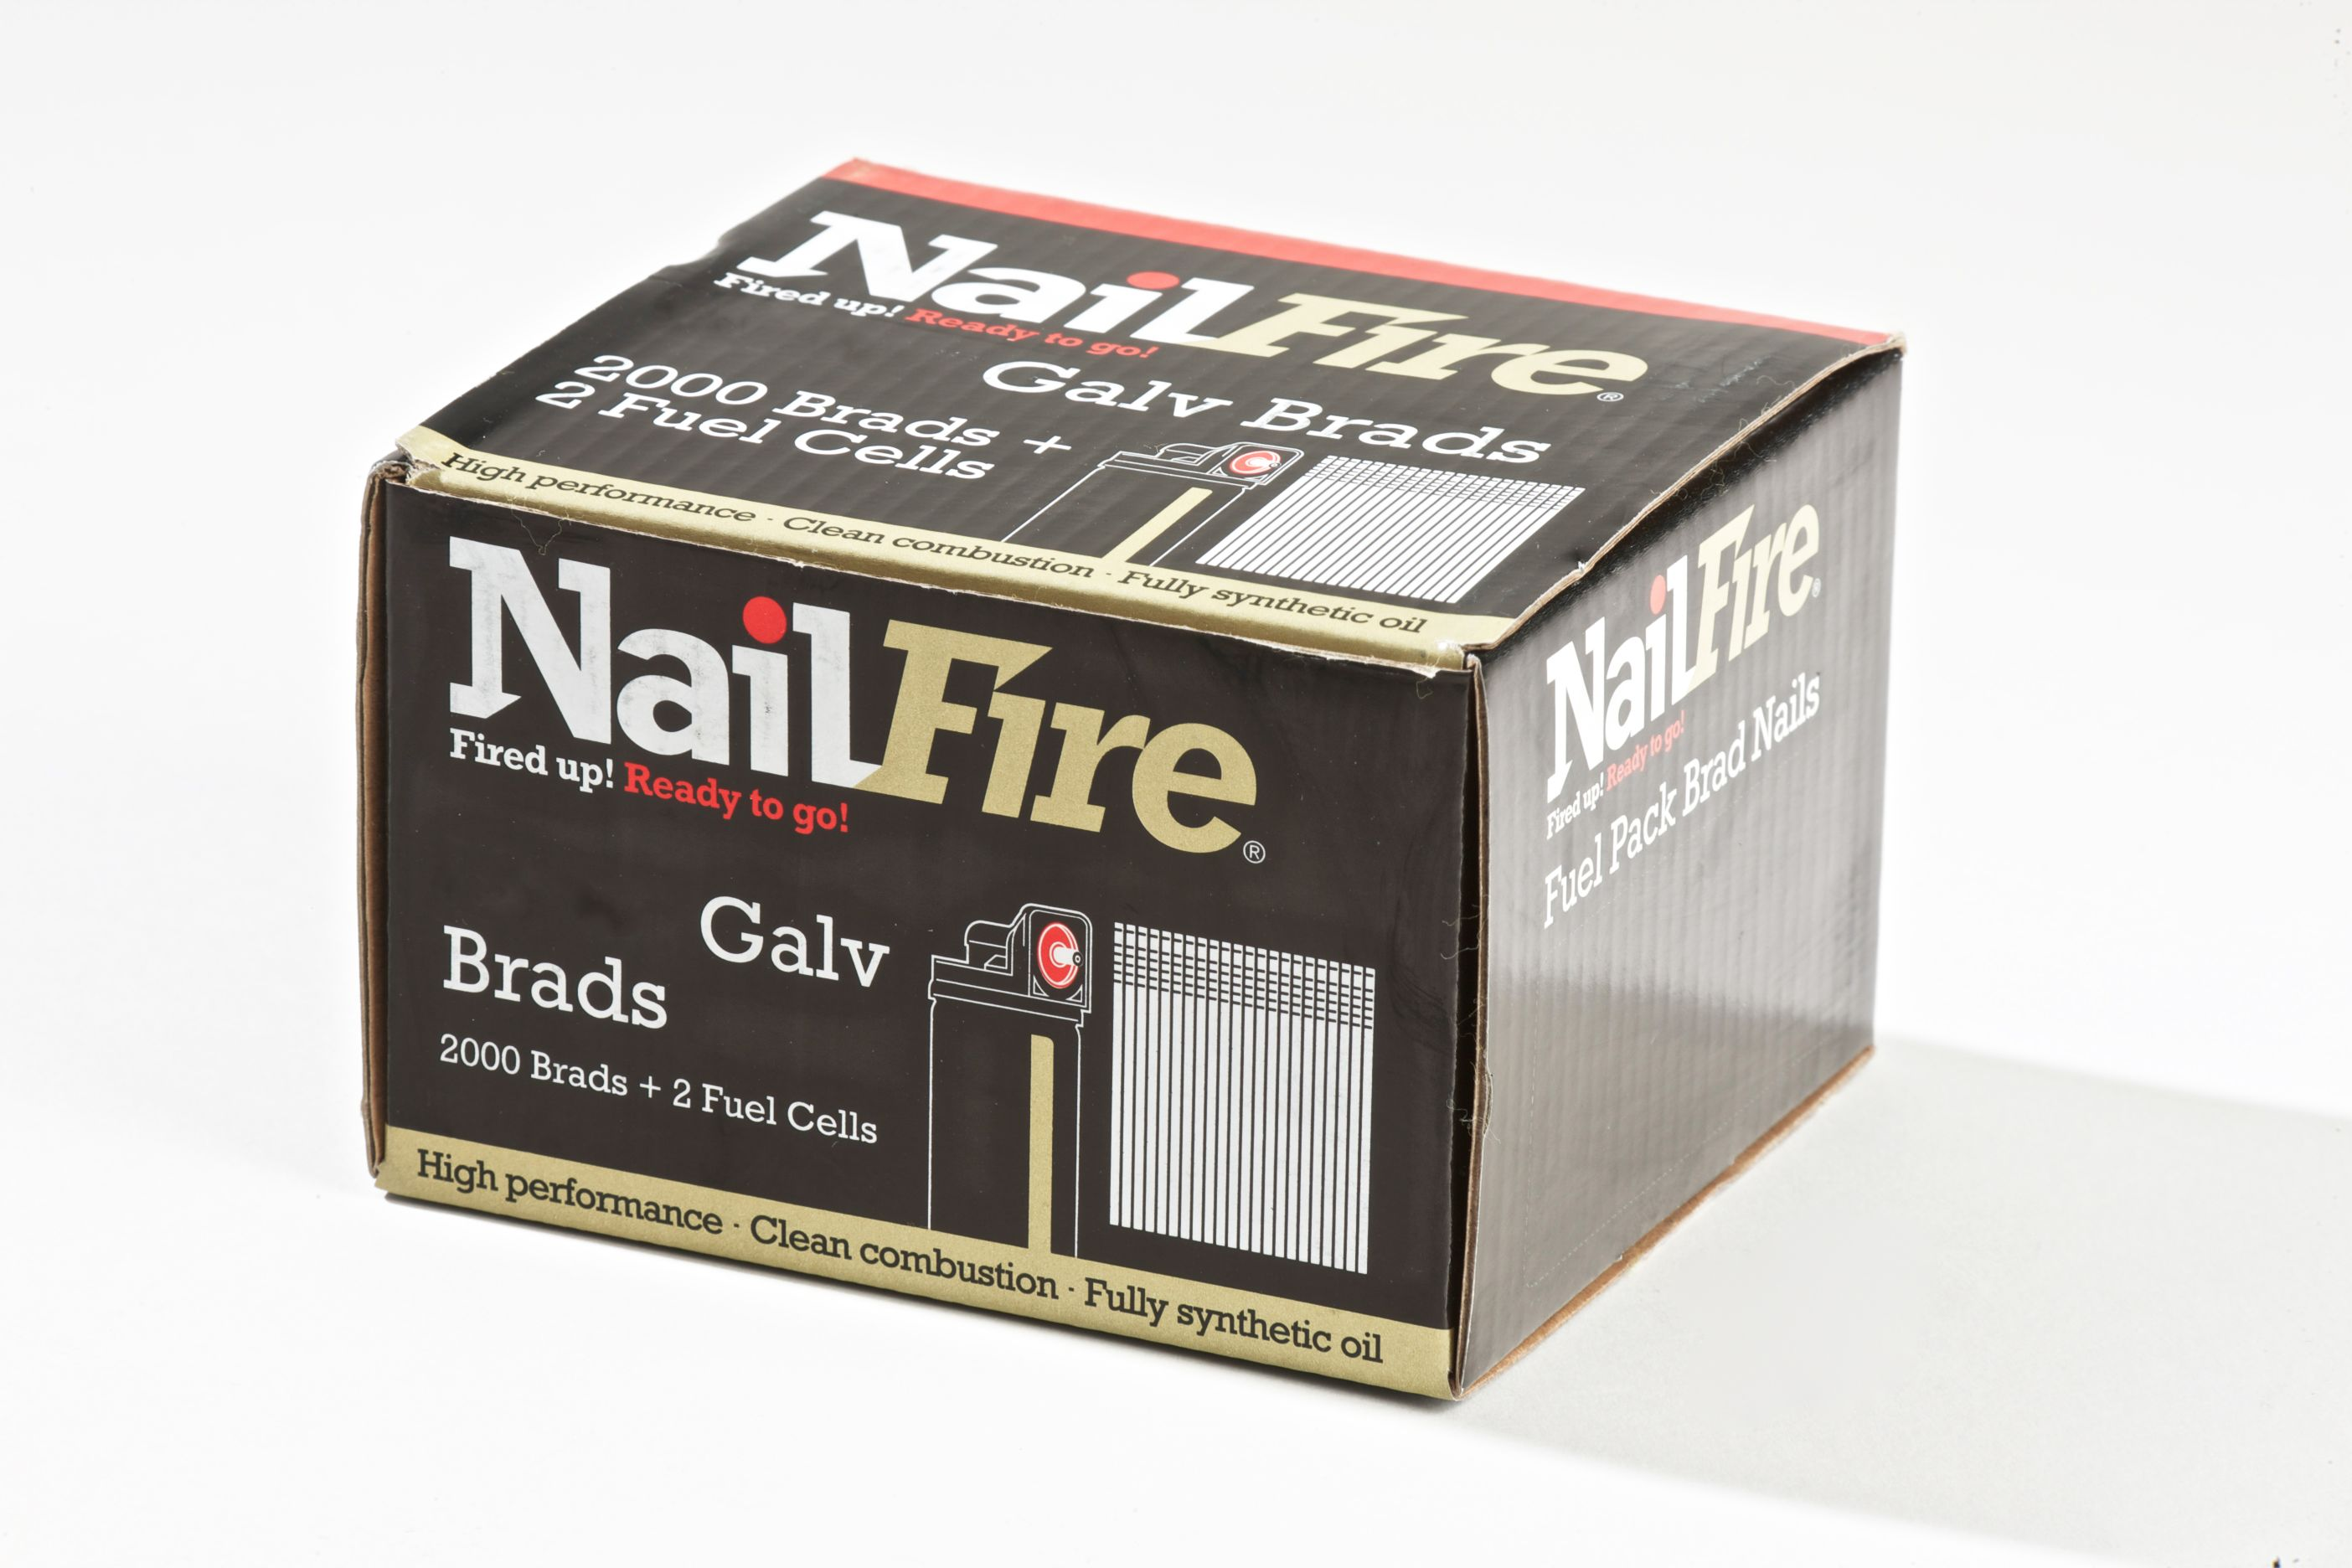 NAILFIRE 2ND FIX STRAIGHT E-GALV BRAD & FUEL PACK 38MM (TUB OF 2000)